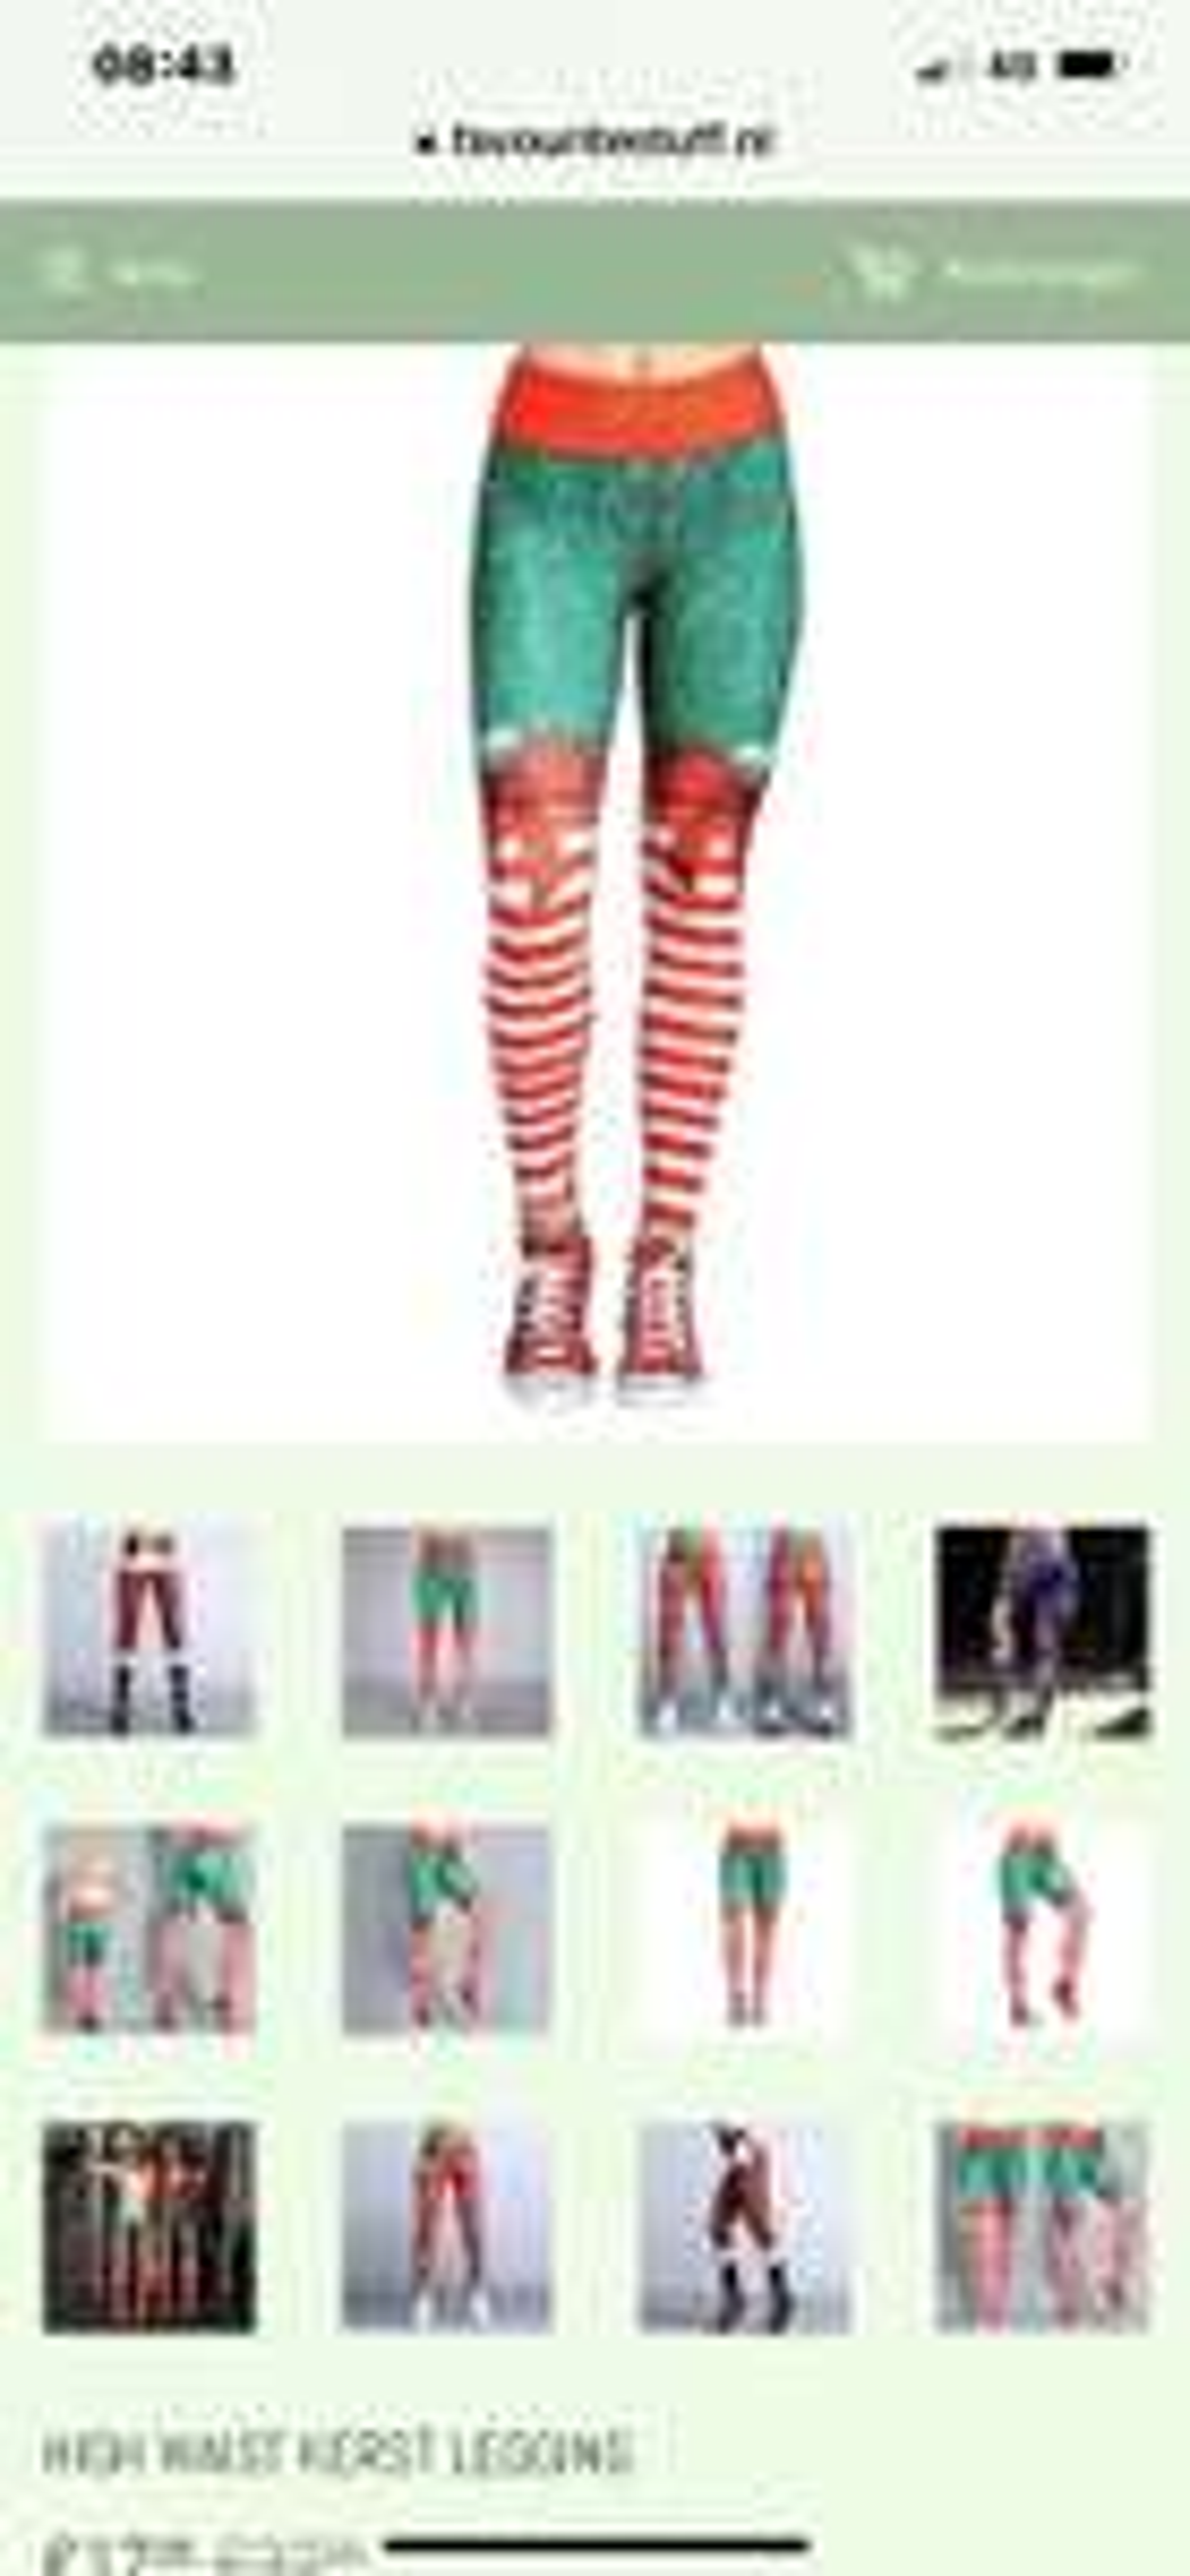 Kerst legging